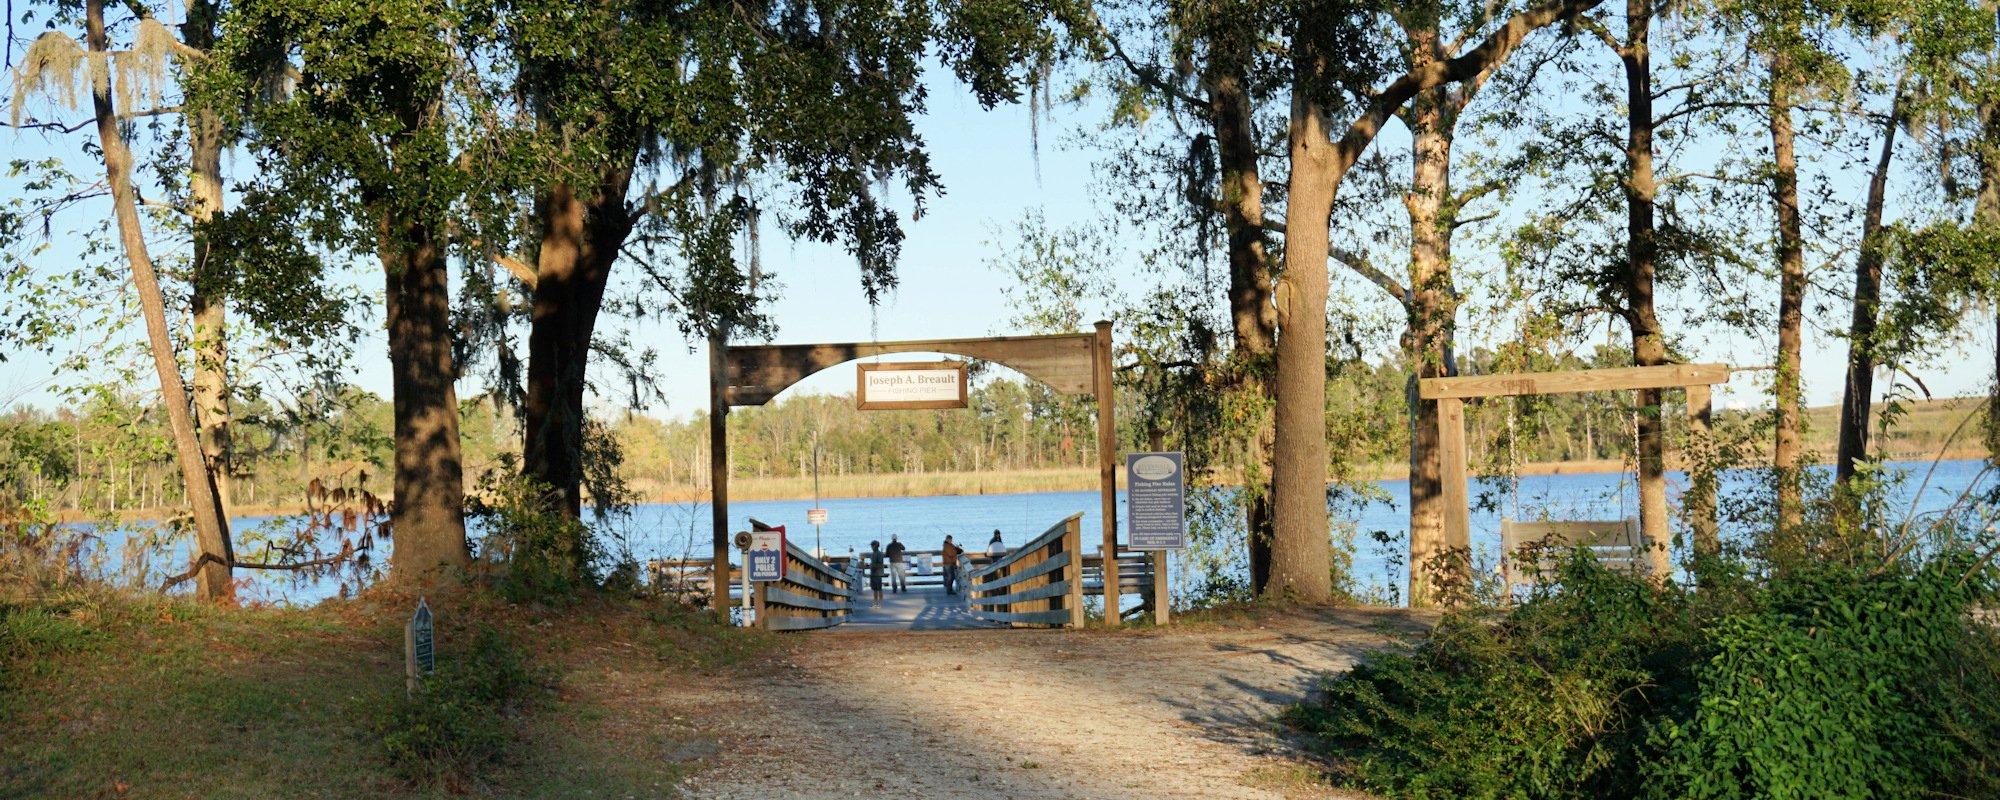 Brunswick Riverwalk at Belville NC - Leland NC